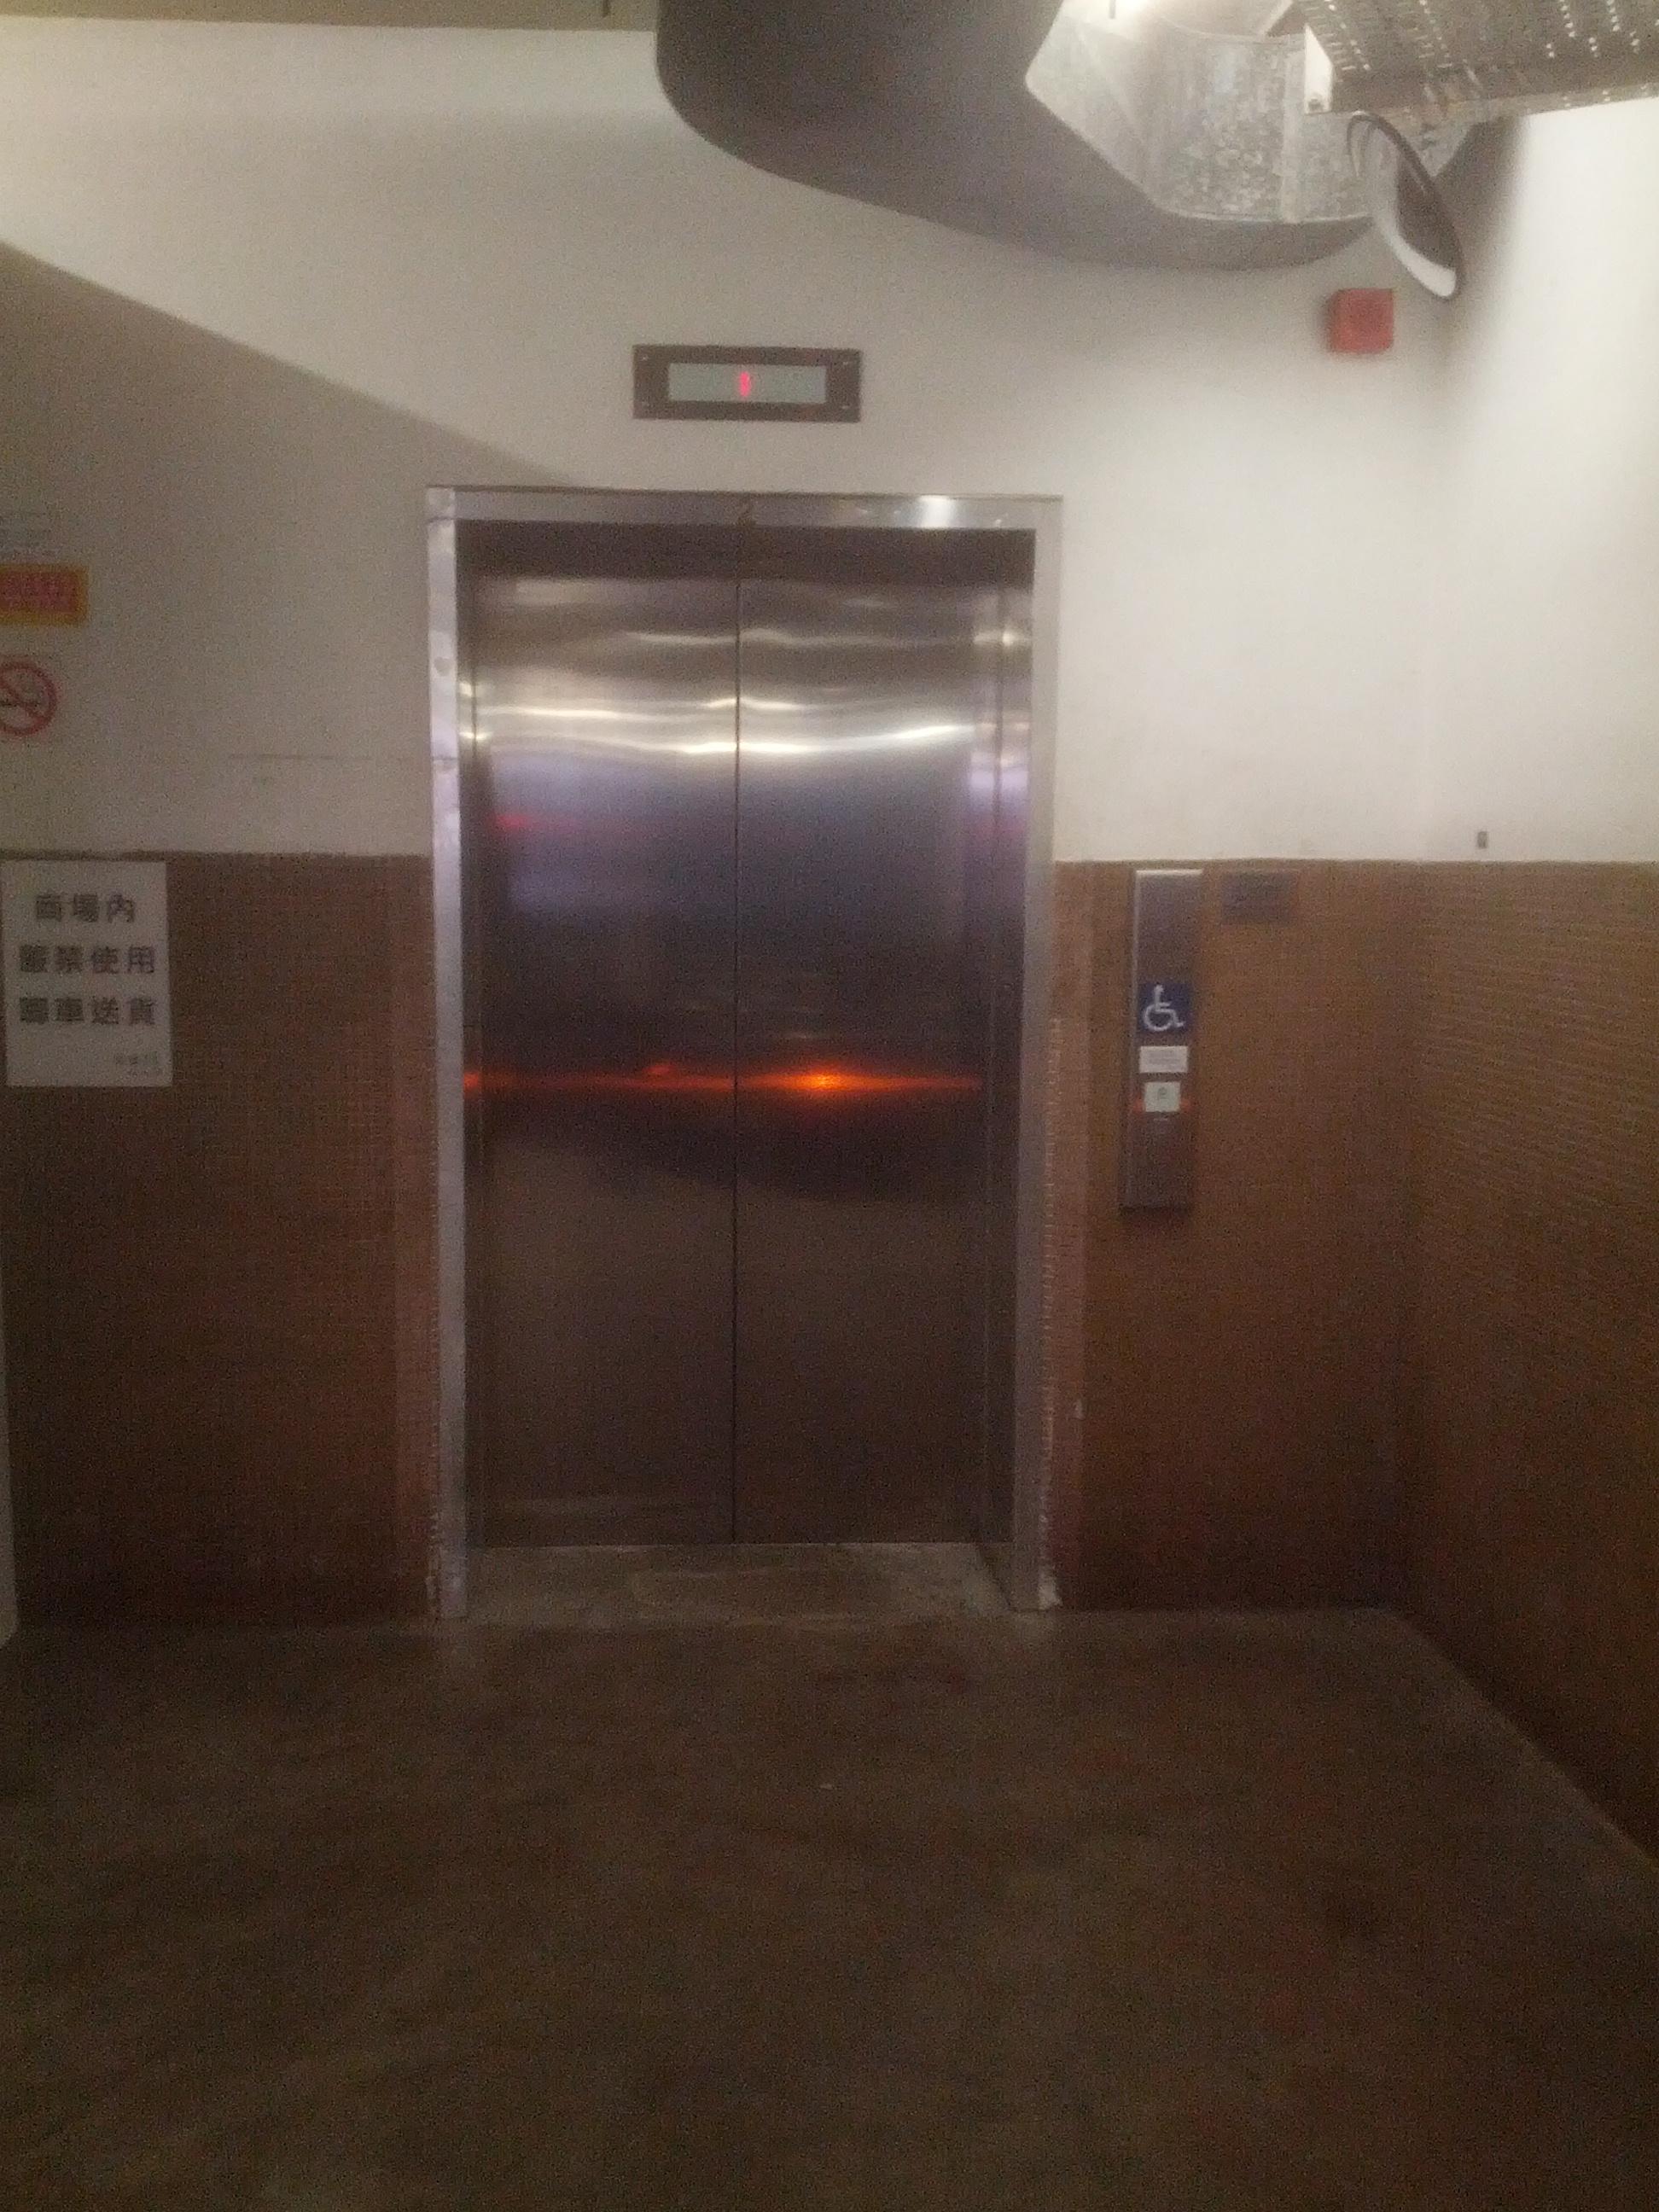 Schindler 5500 | Elevator Wiki | FANDOM powered by Wikia